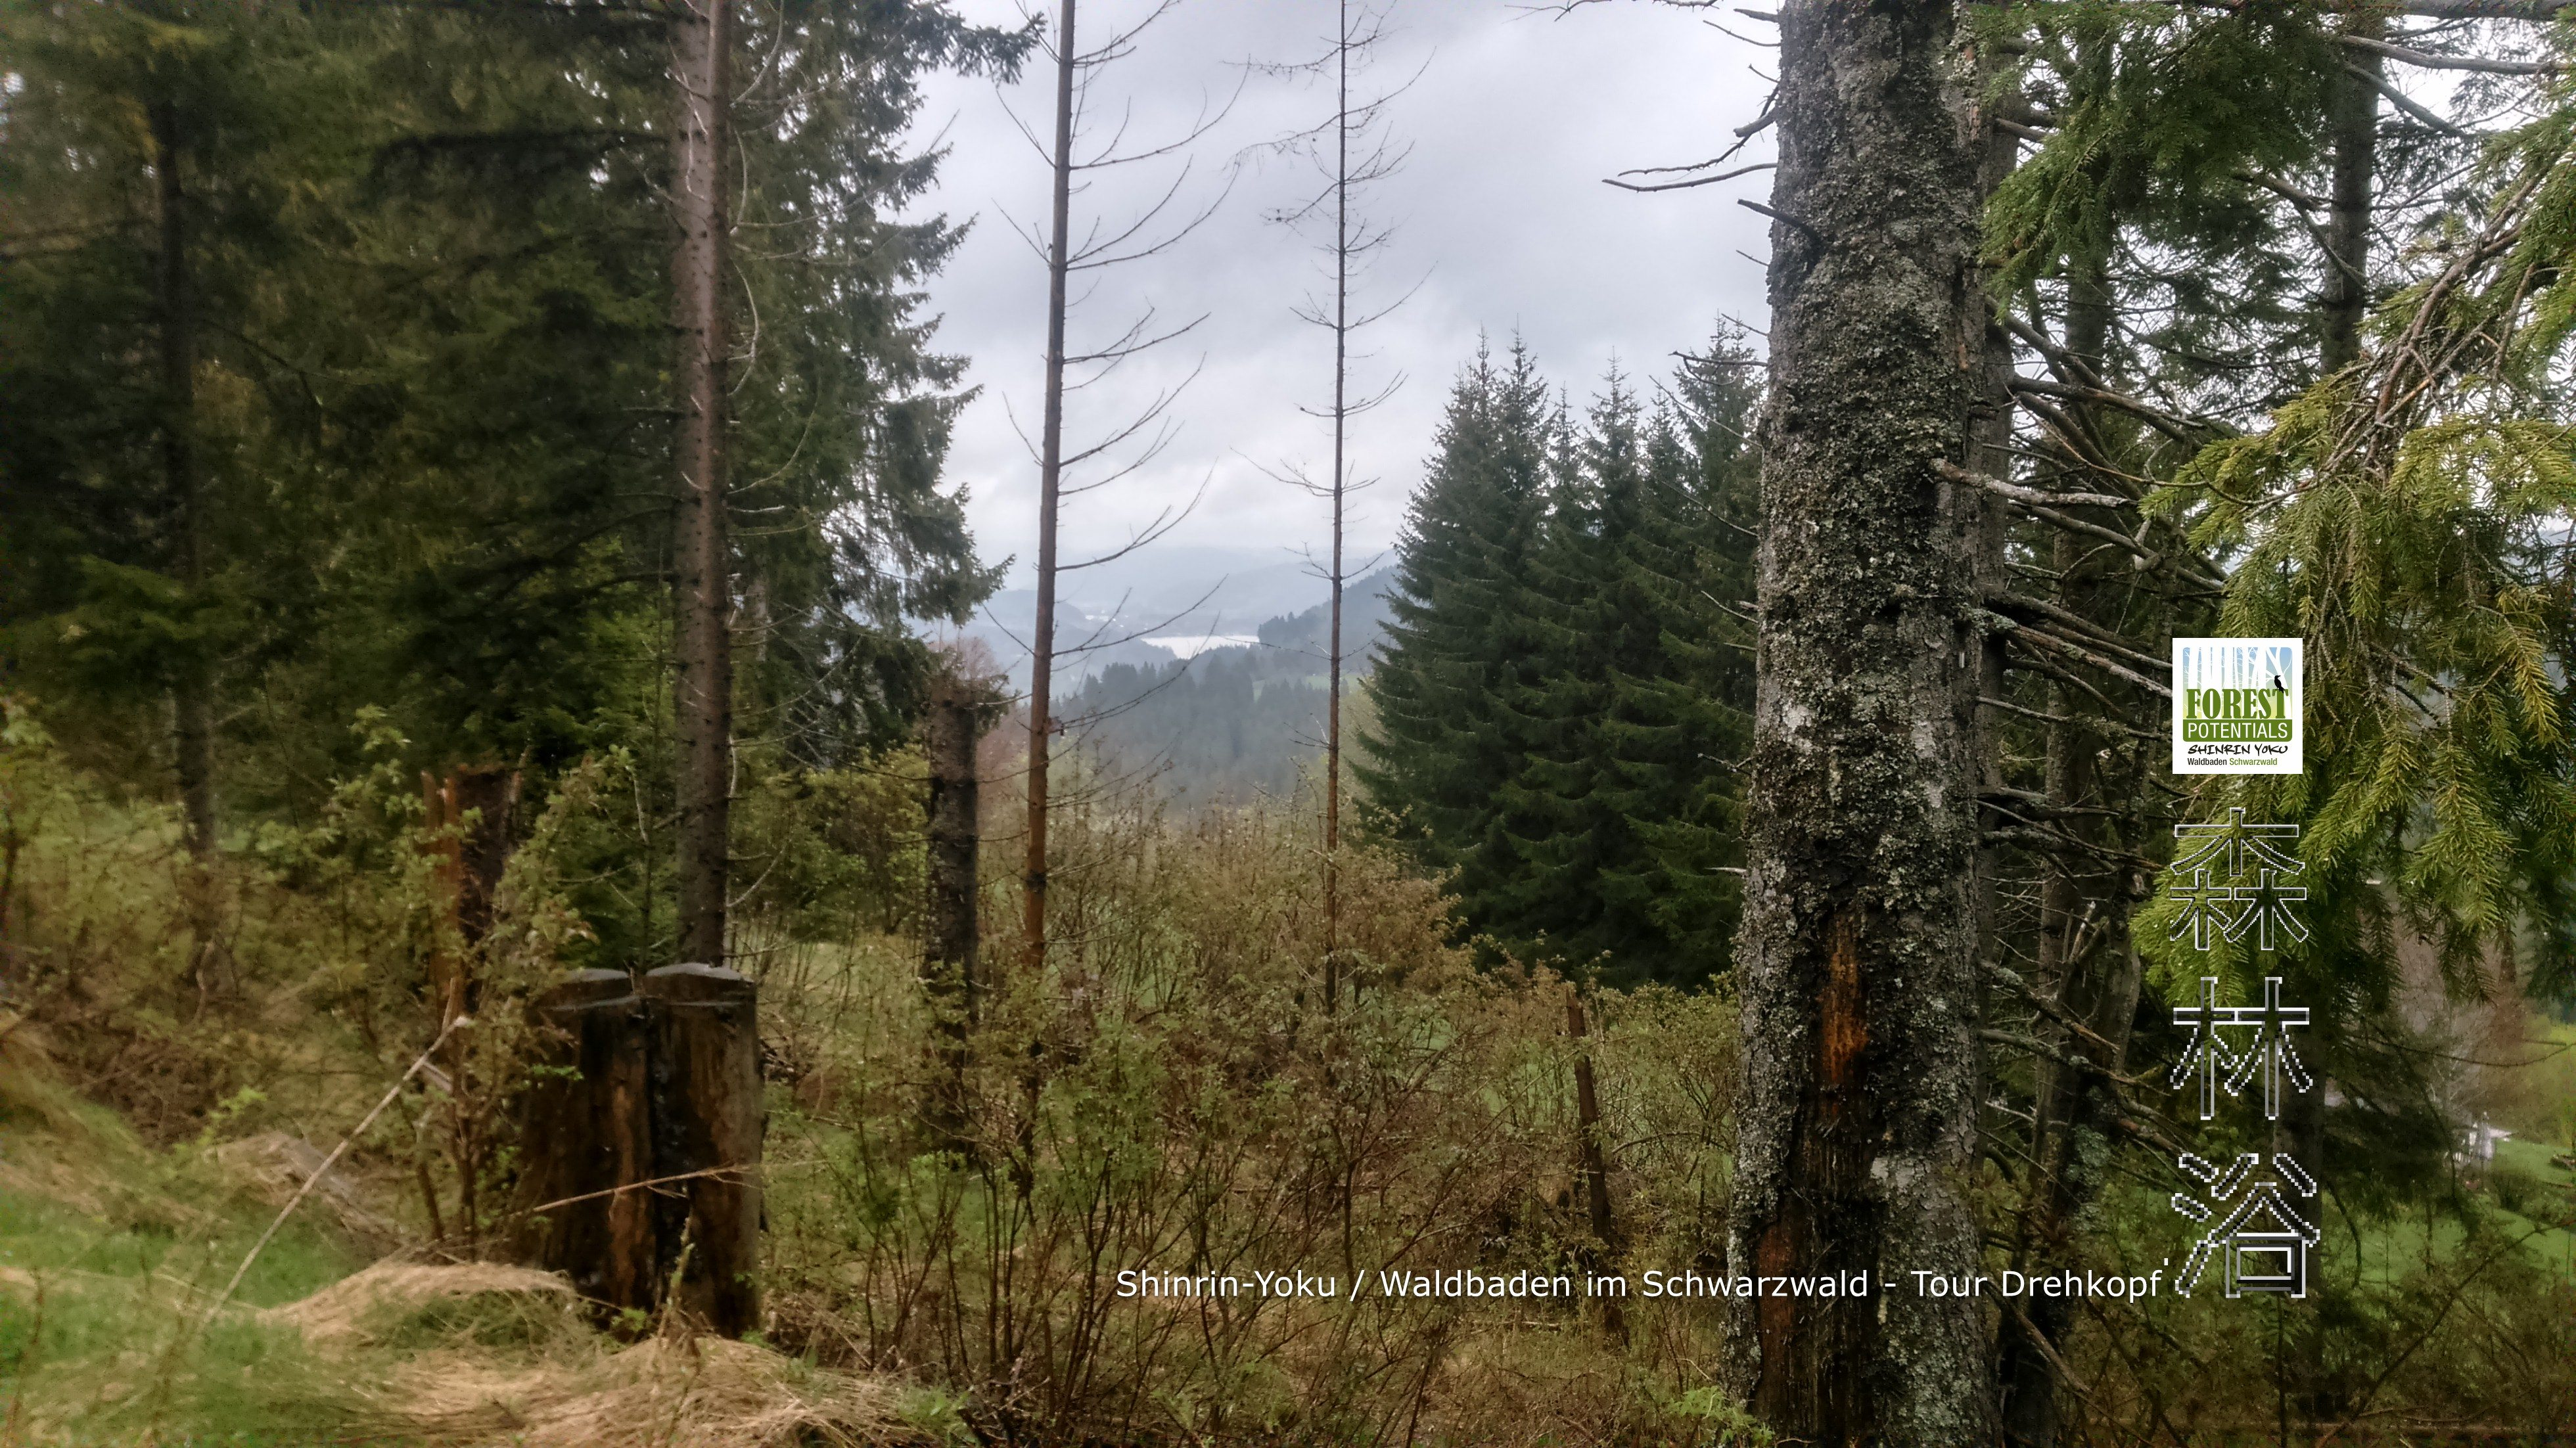 Shinrin-Yoku Waldbaden im Schwarzwald